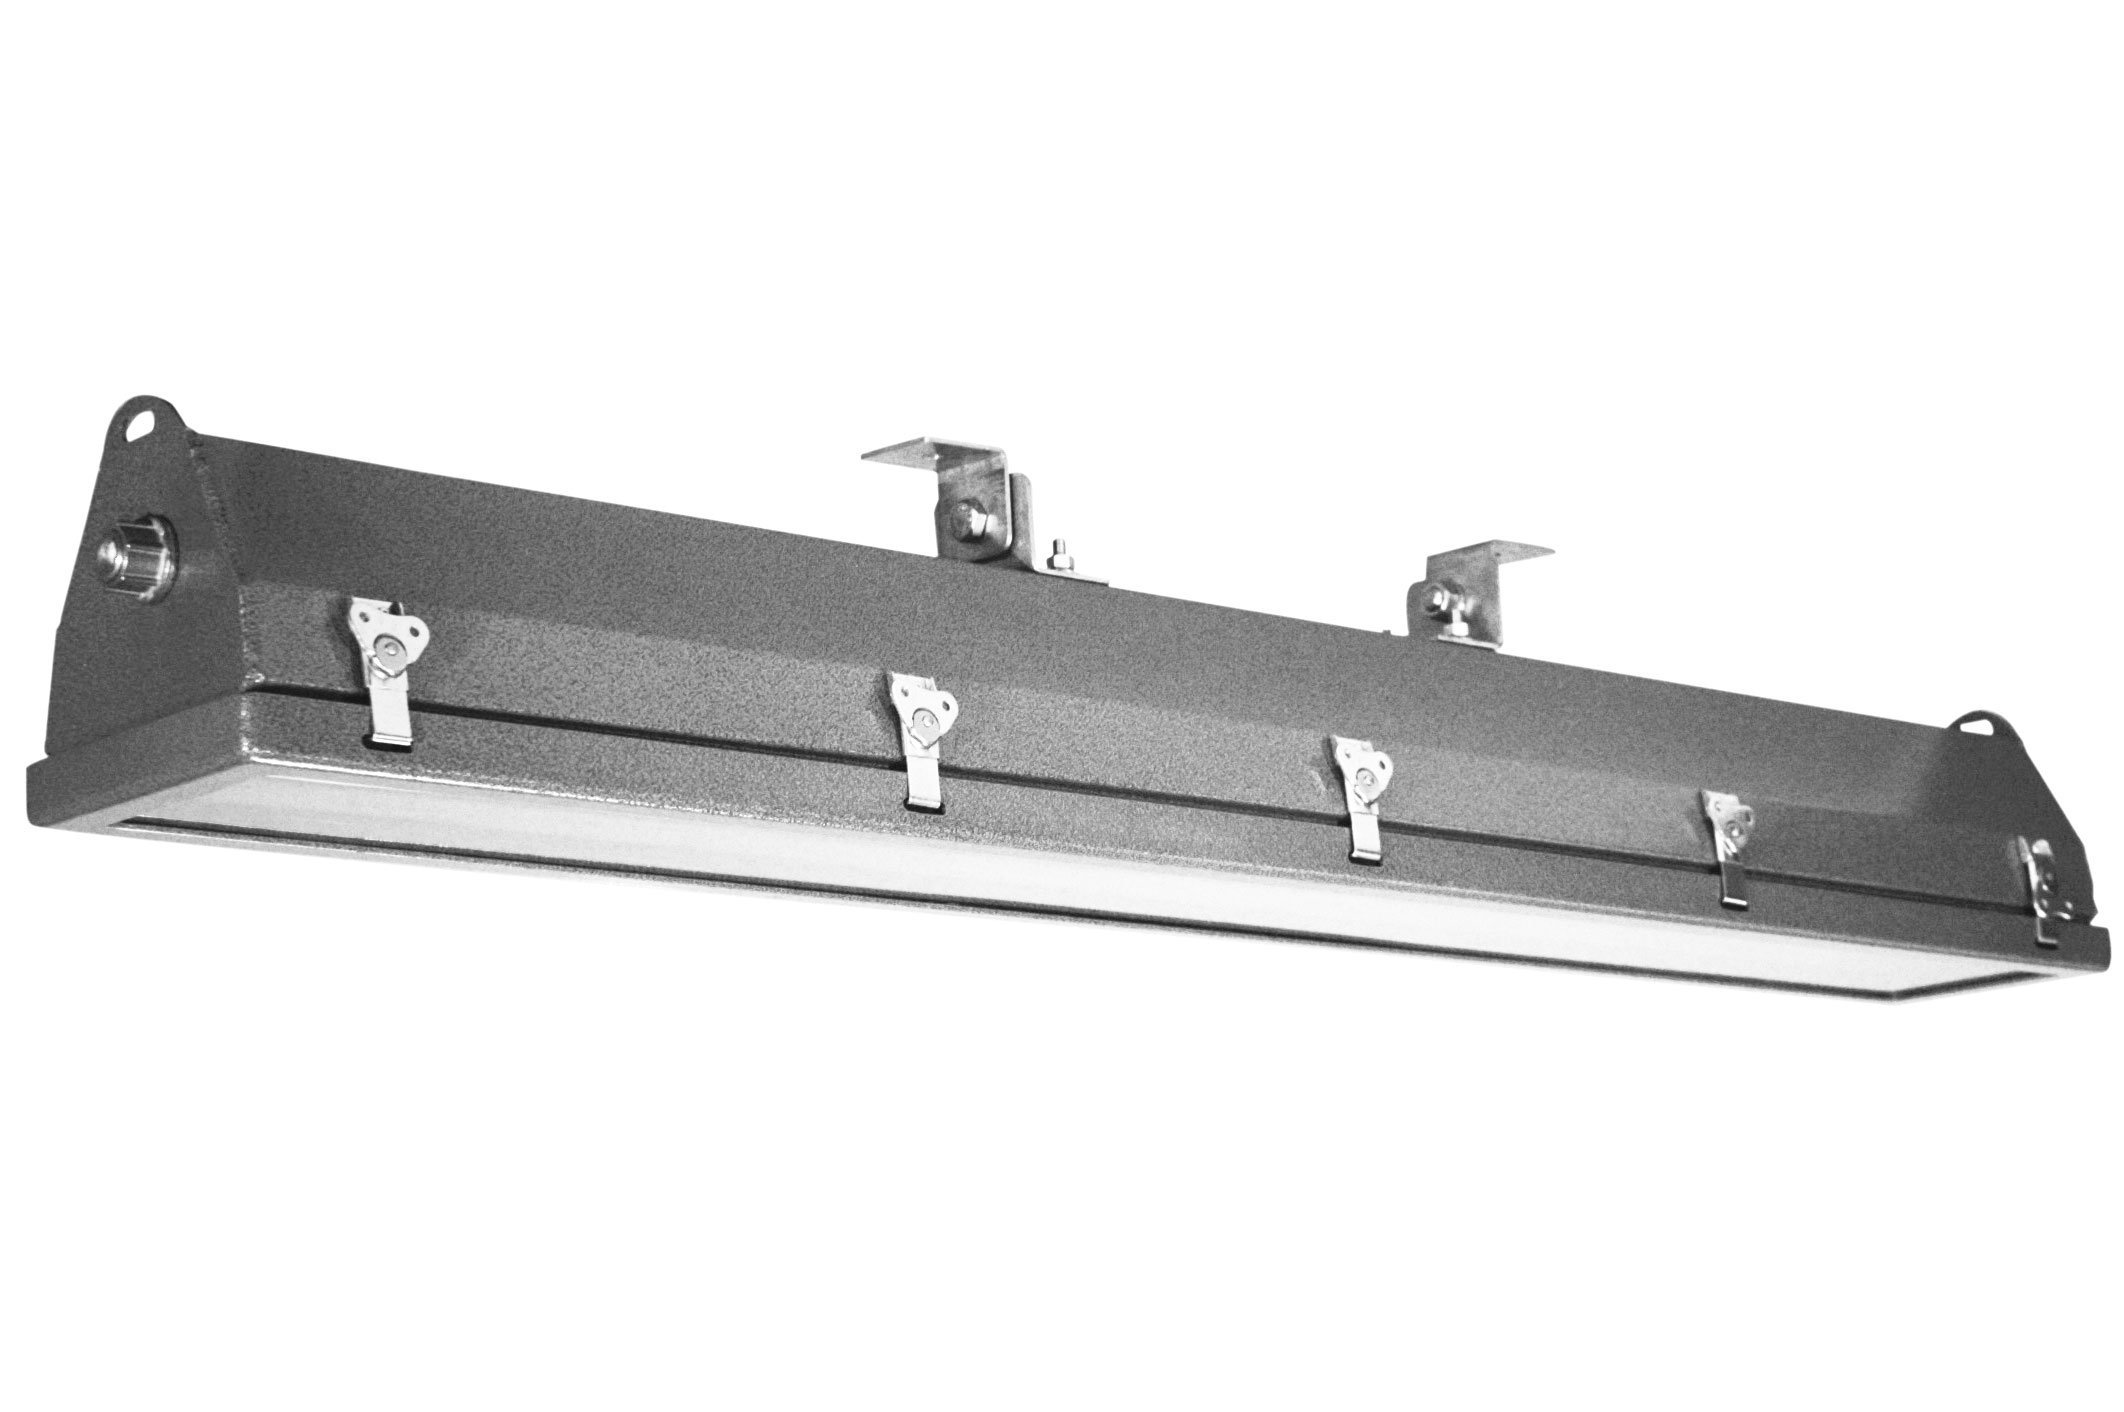 56W Hazardous Location Aluminum LED Light - 6720 Lumens - Factory Installed Terminal Strips - C1D1 by Larson Electronics